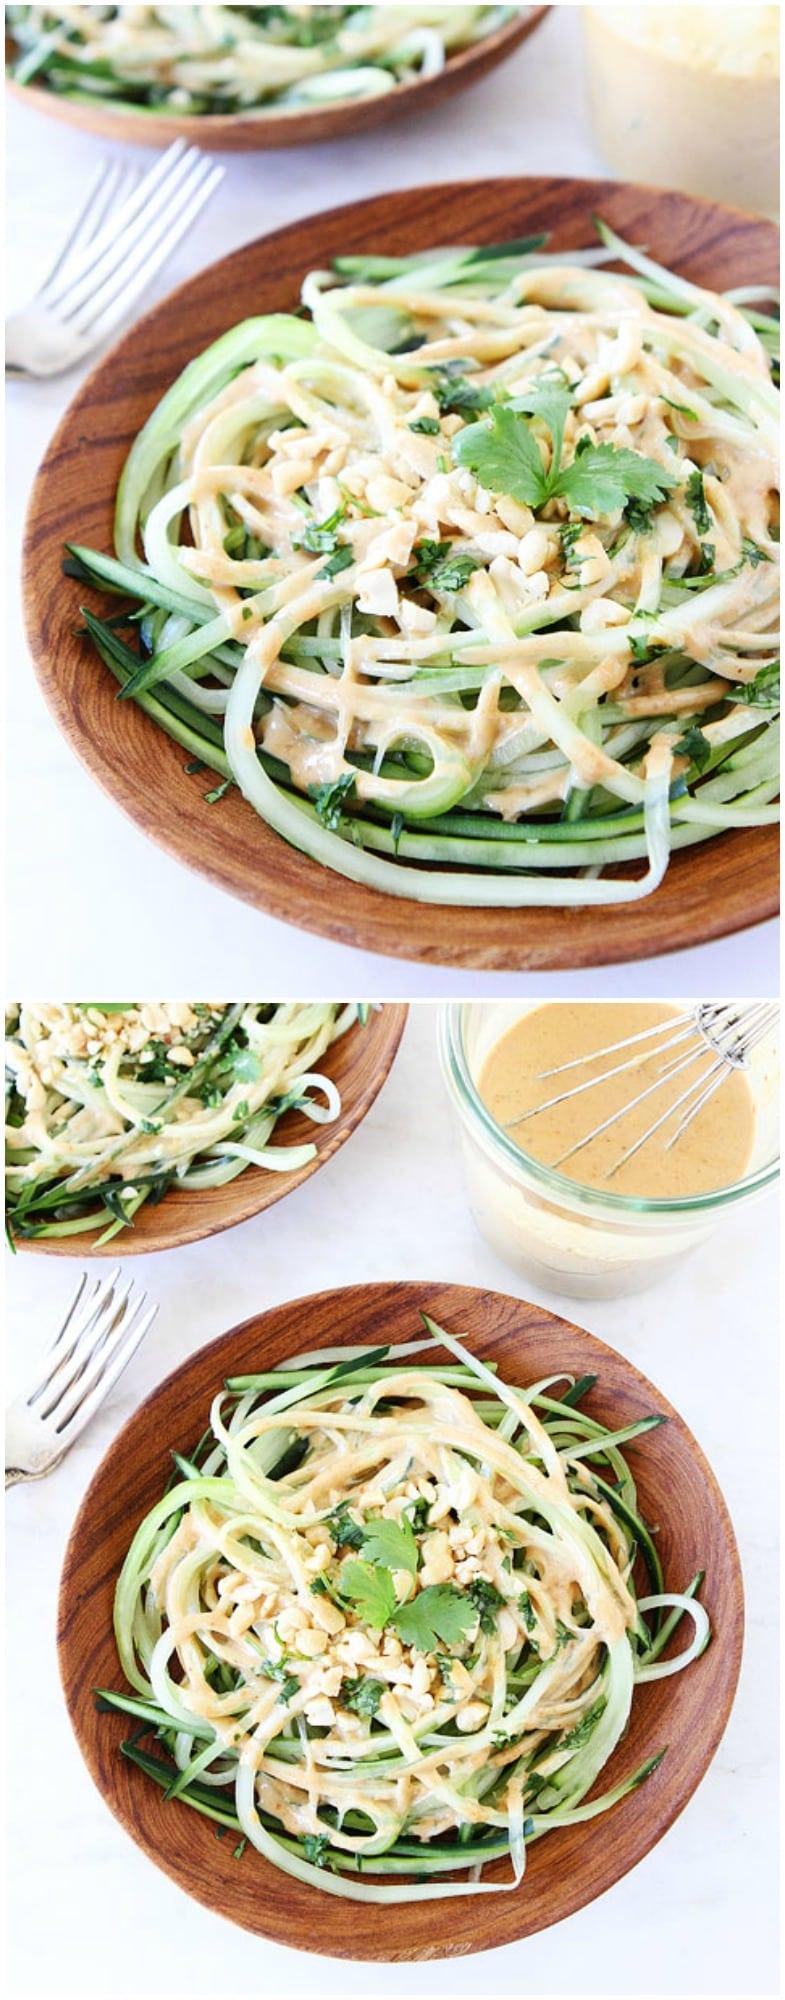 Cucumber Noodles with Peanut Sauce Recipe